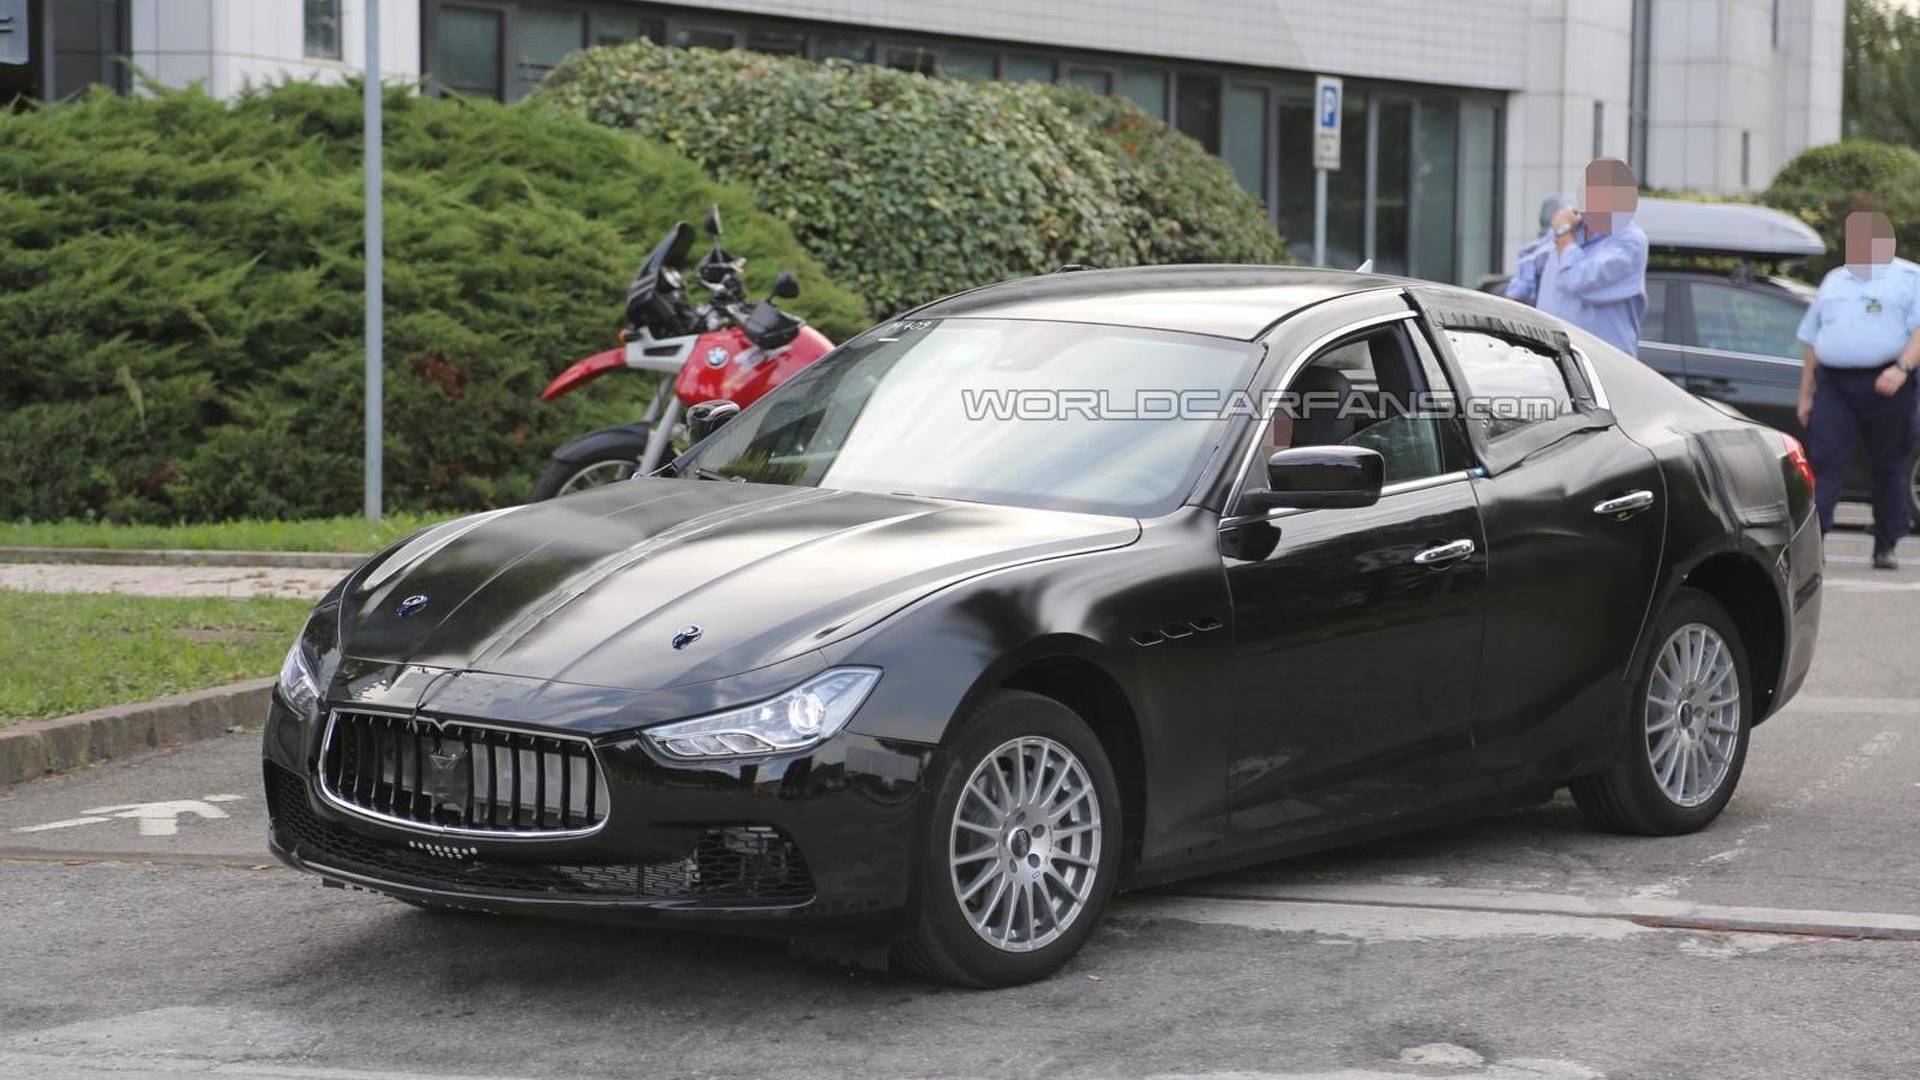 Alfa Romeo confirms all-new sedan will be unveiled on June 24, hints at Giulia moniker